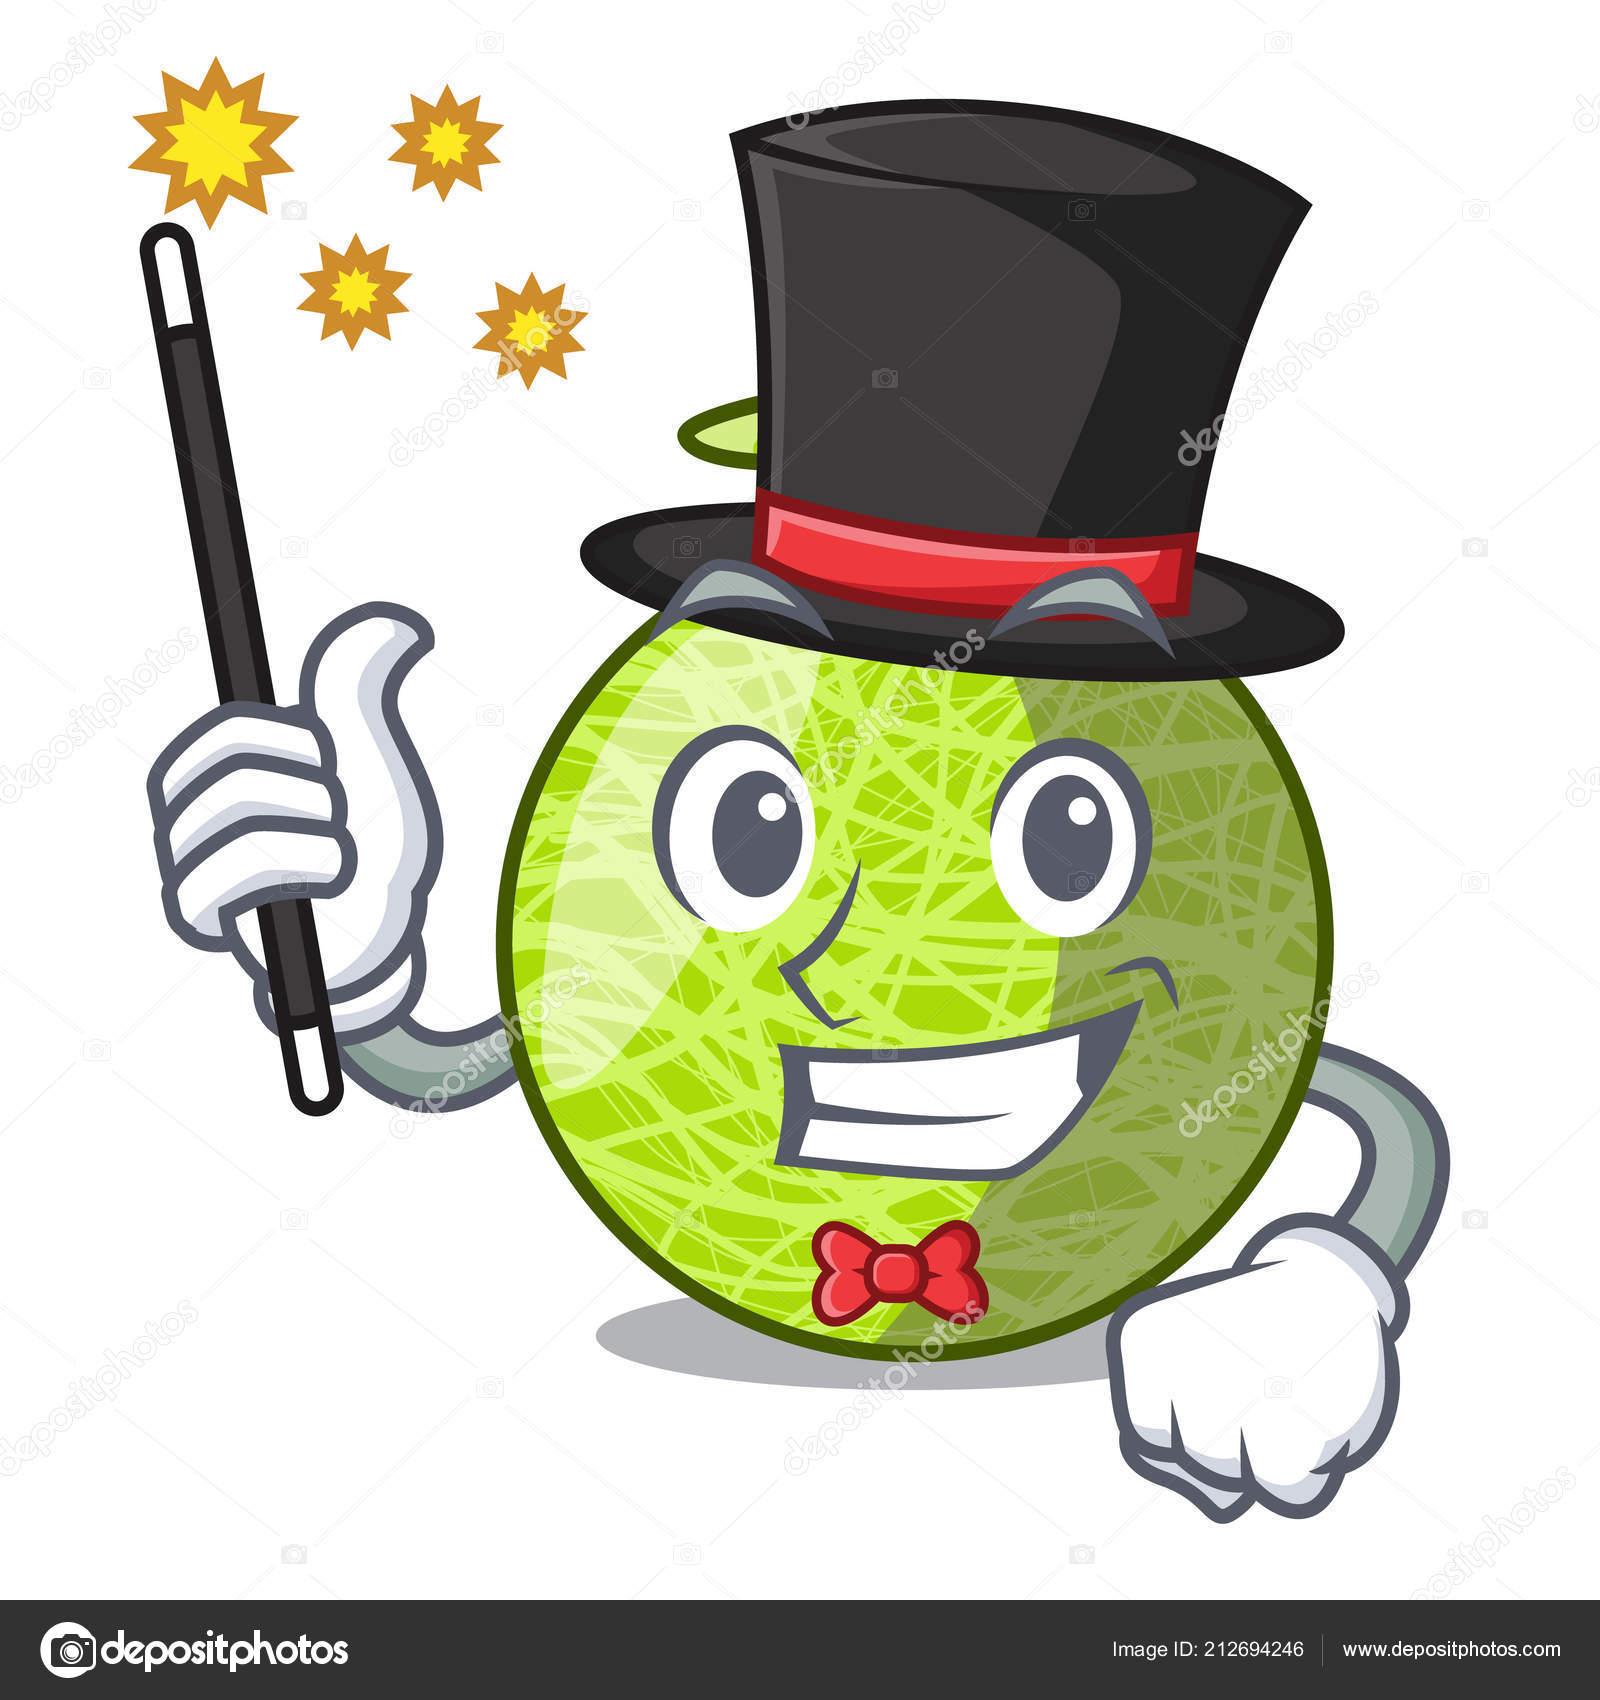 kitchen magician walmart cabinets 魔术师卡通熟瓜水果在厨房里 图库矢量图像 c kongvector 212694246 图库矢量图片